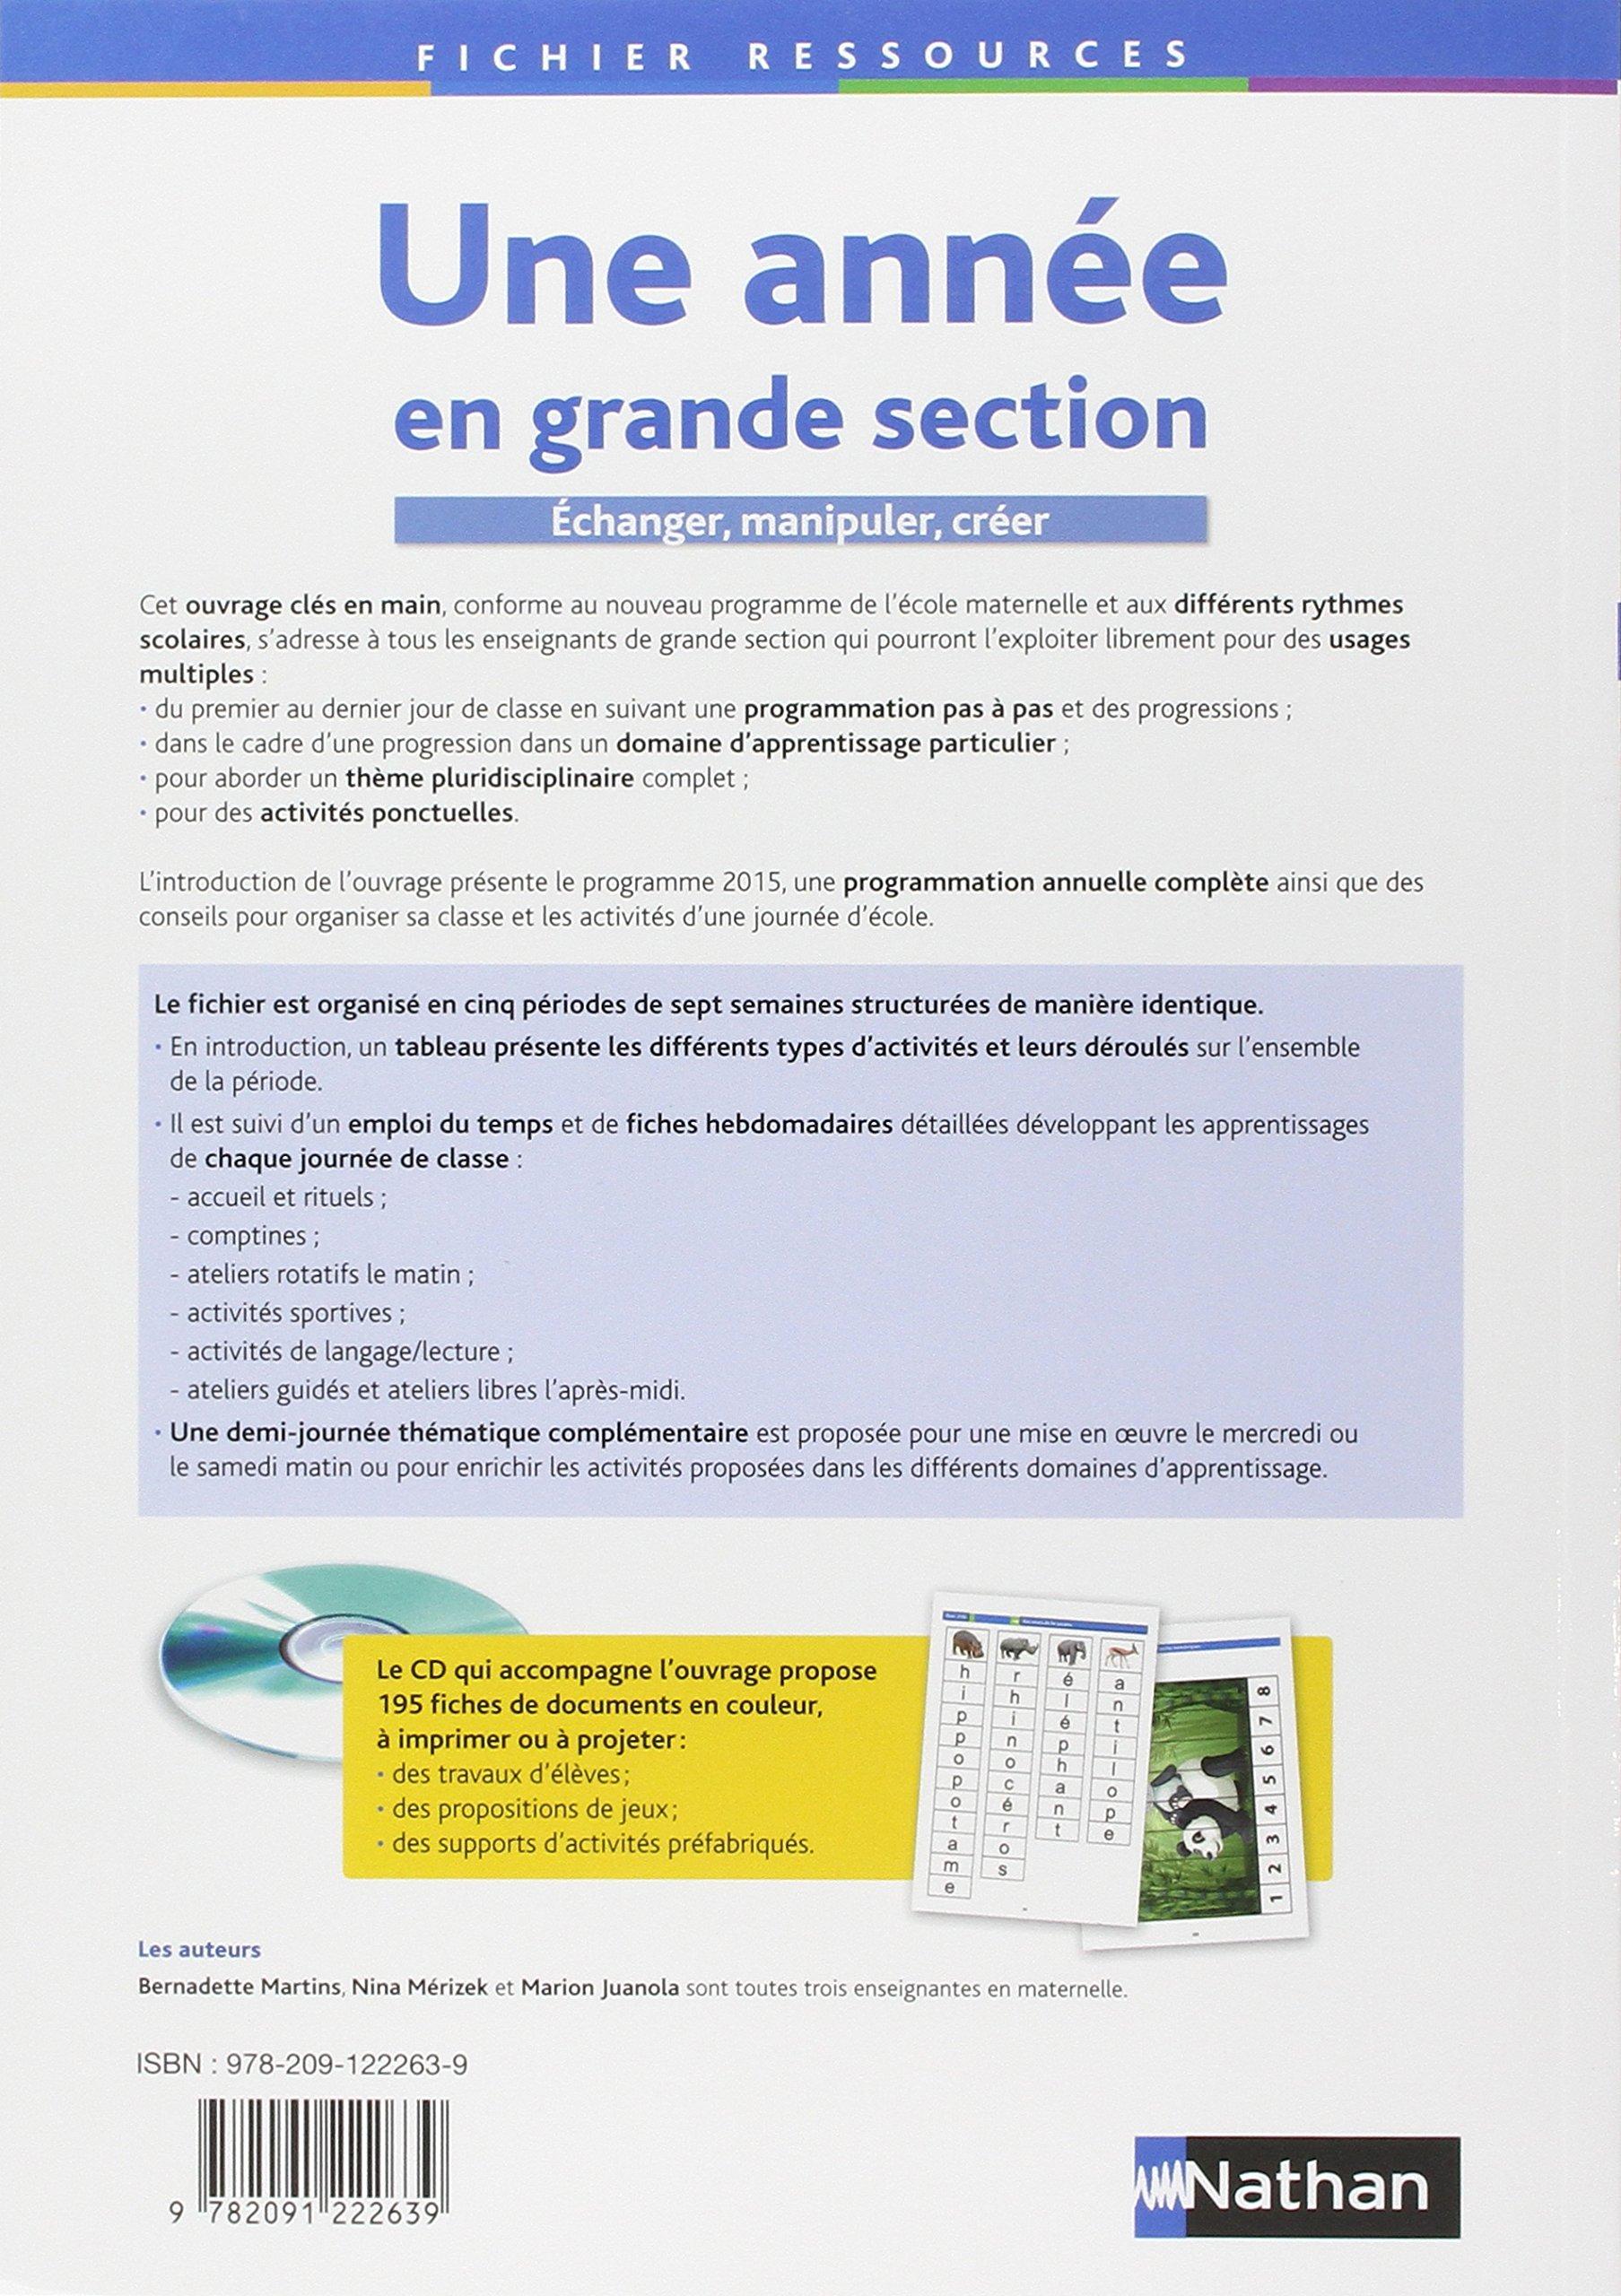 Une année en grande section: Amazon.fr: Marion Juanola, Nina Mérizek,  Bernadette Martins: Livres